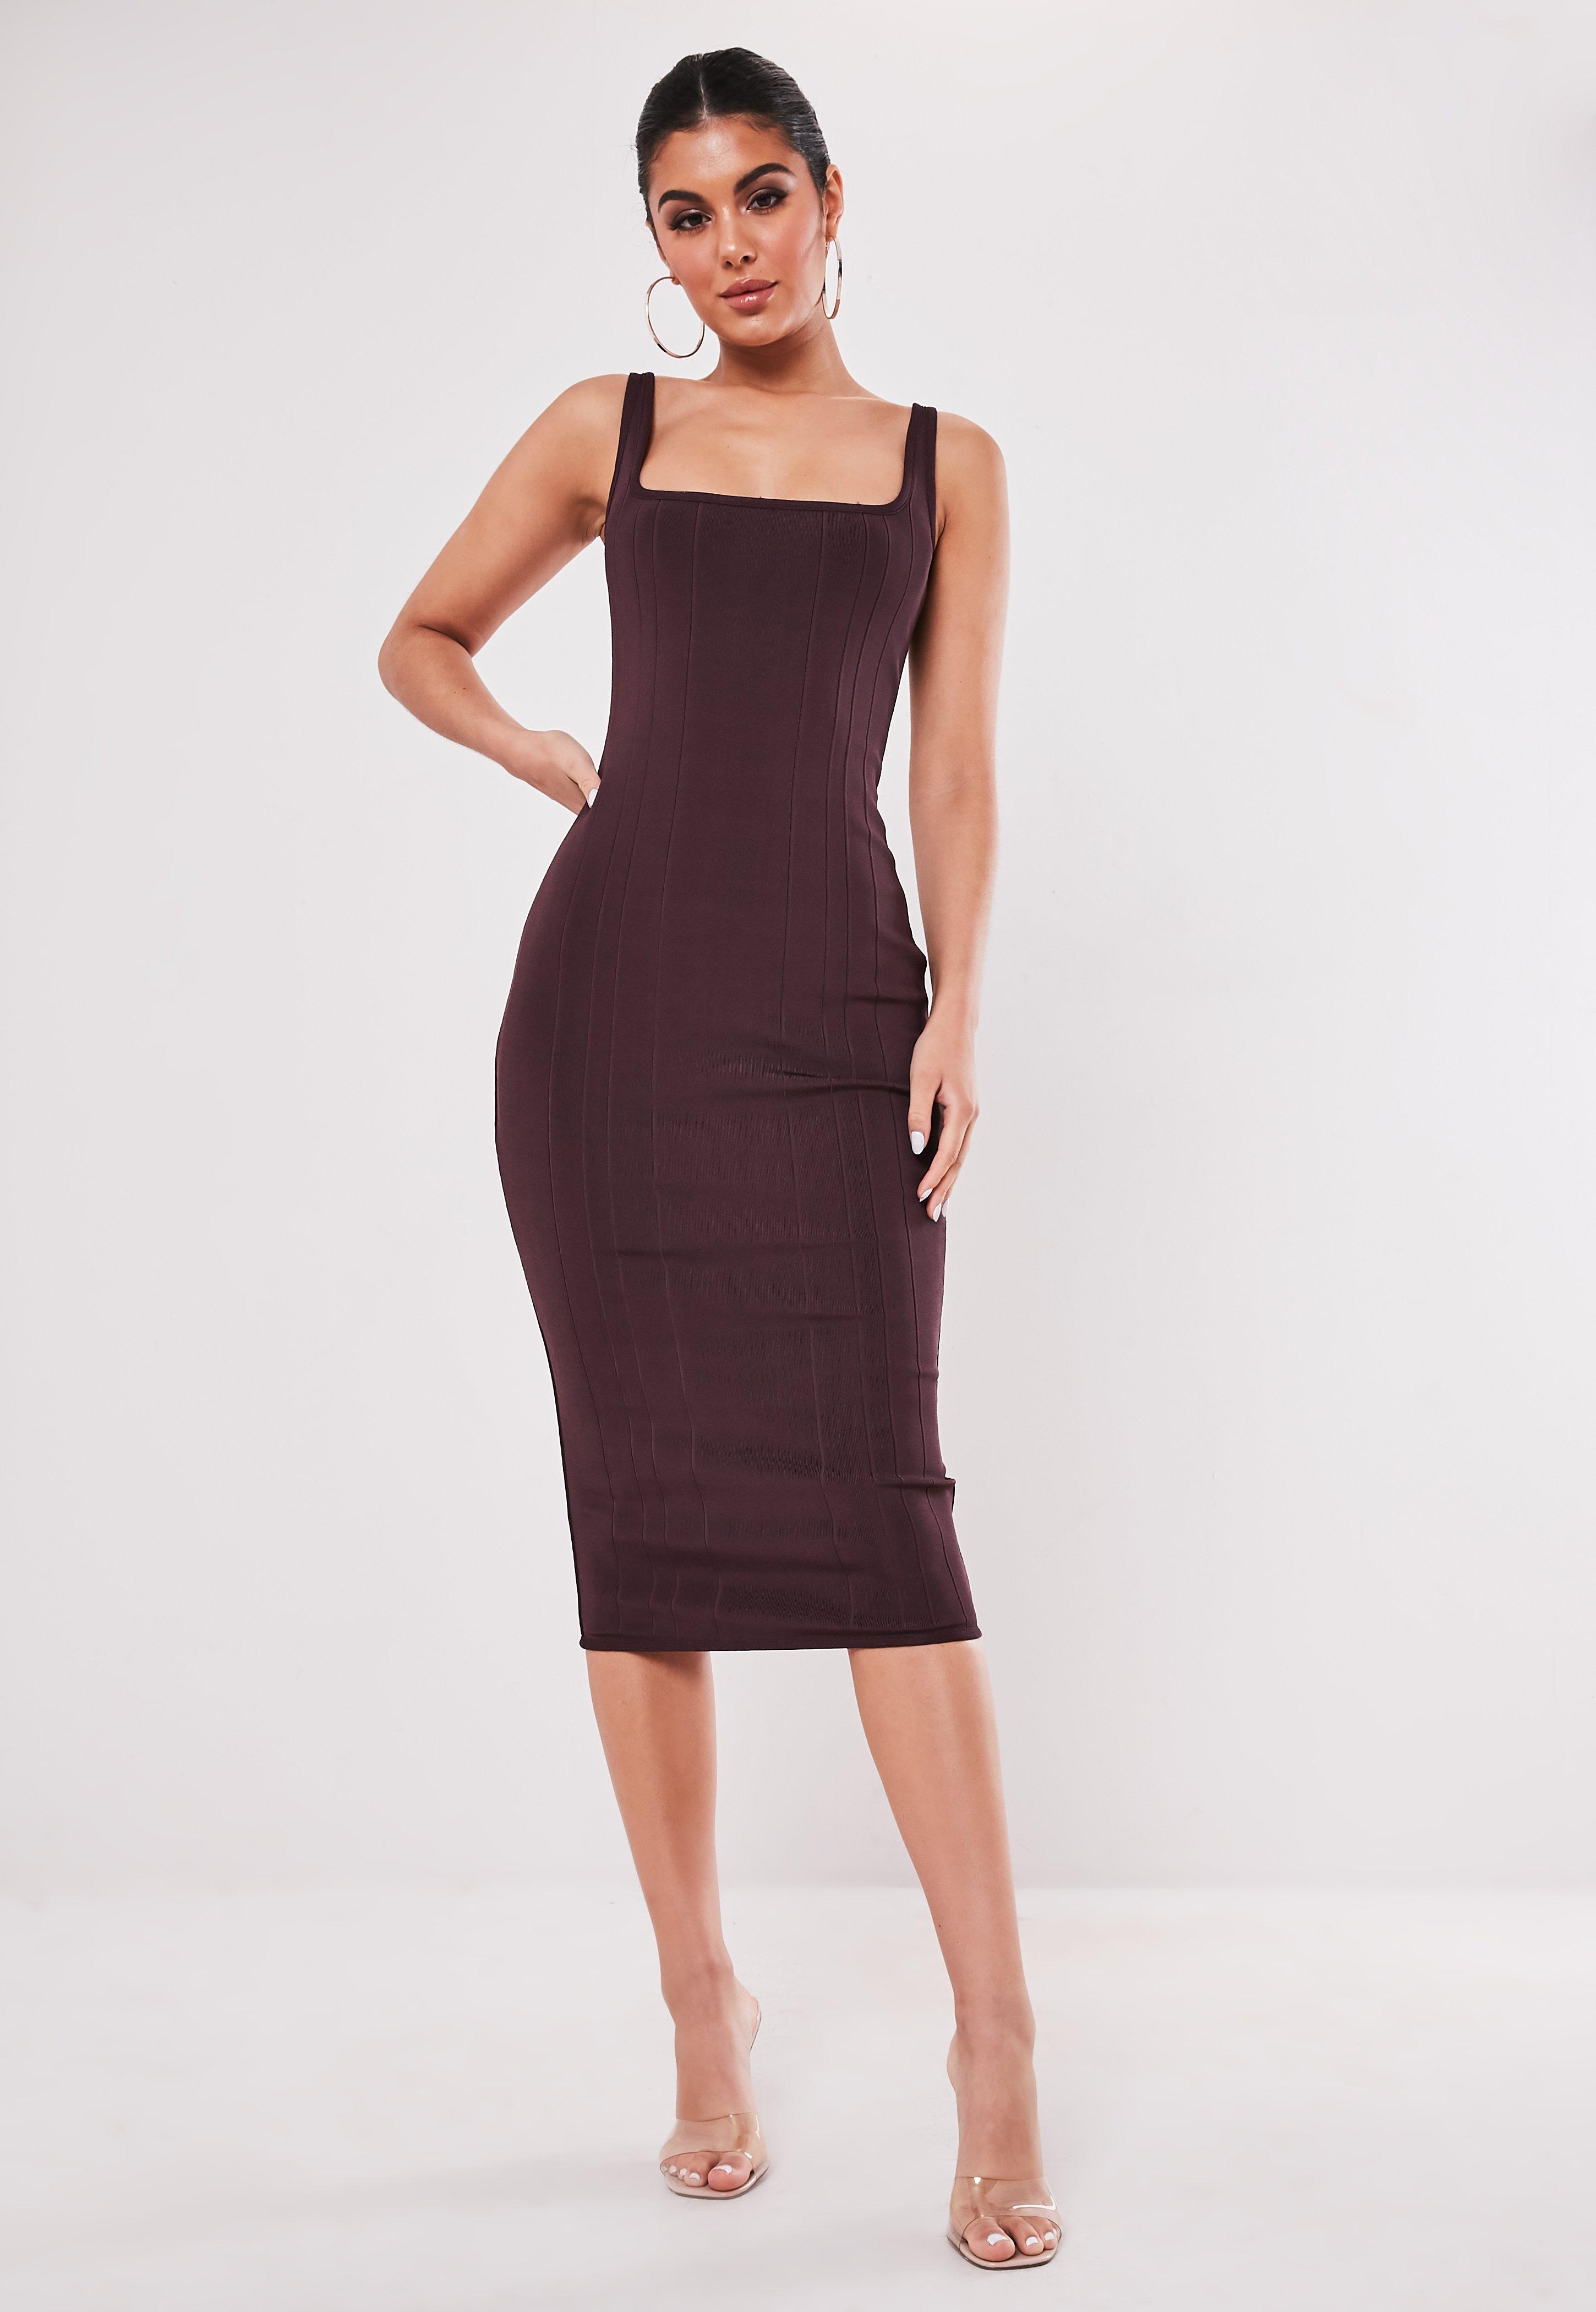 Bandage Kleid Size 18 Online Store 71424 1e044